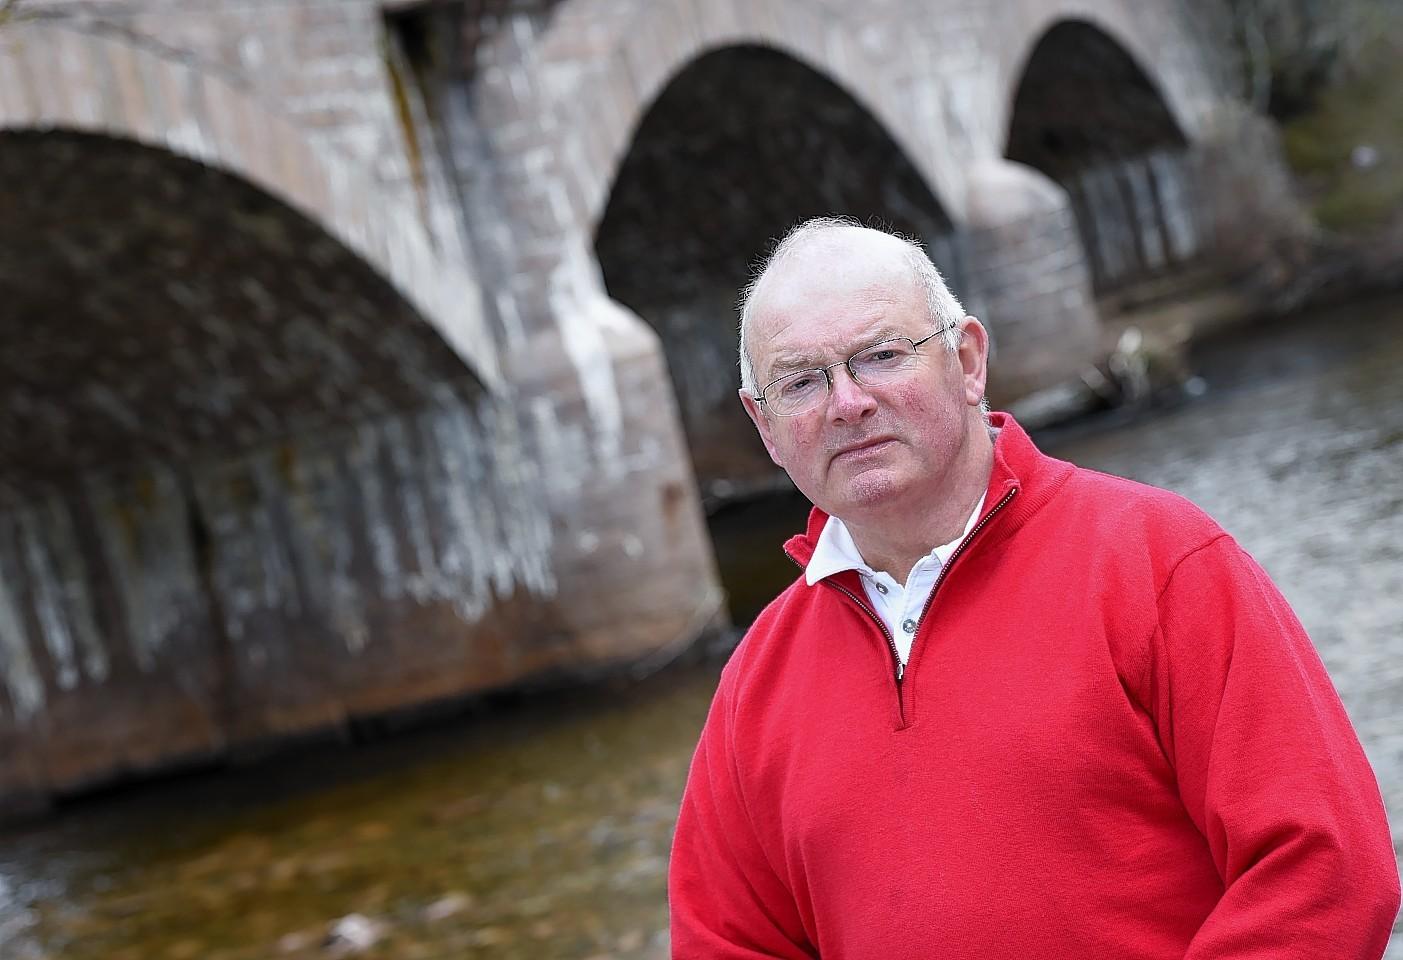 Ballater Flood Group co-ordinator Tony Cox